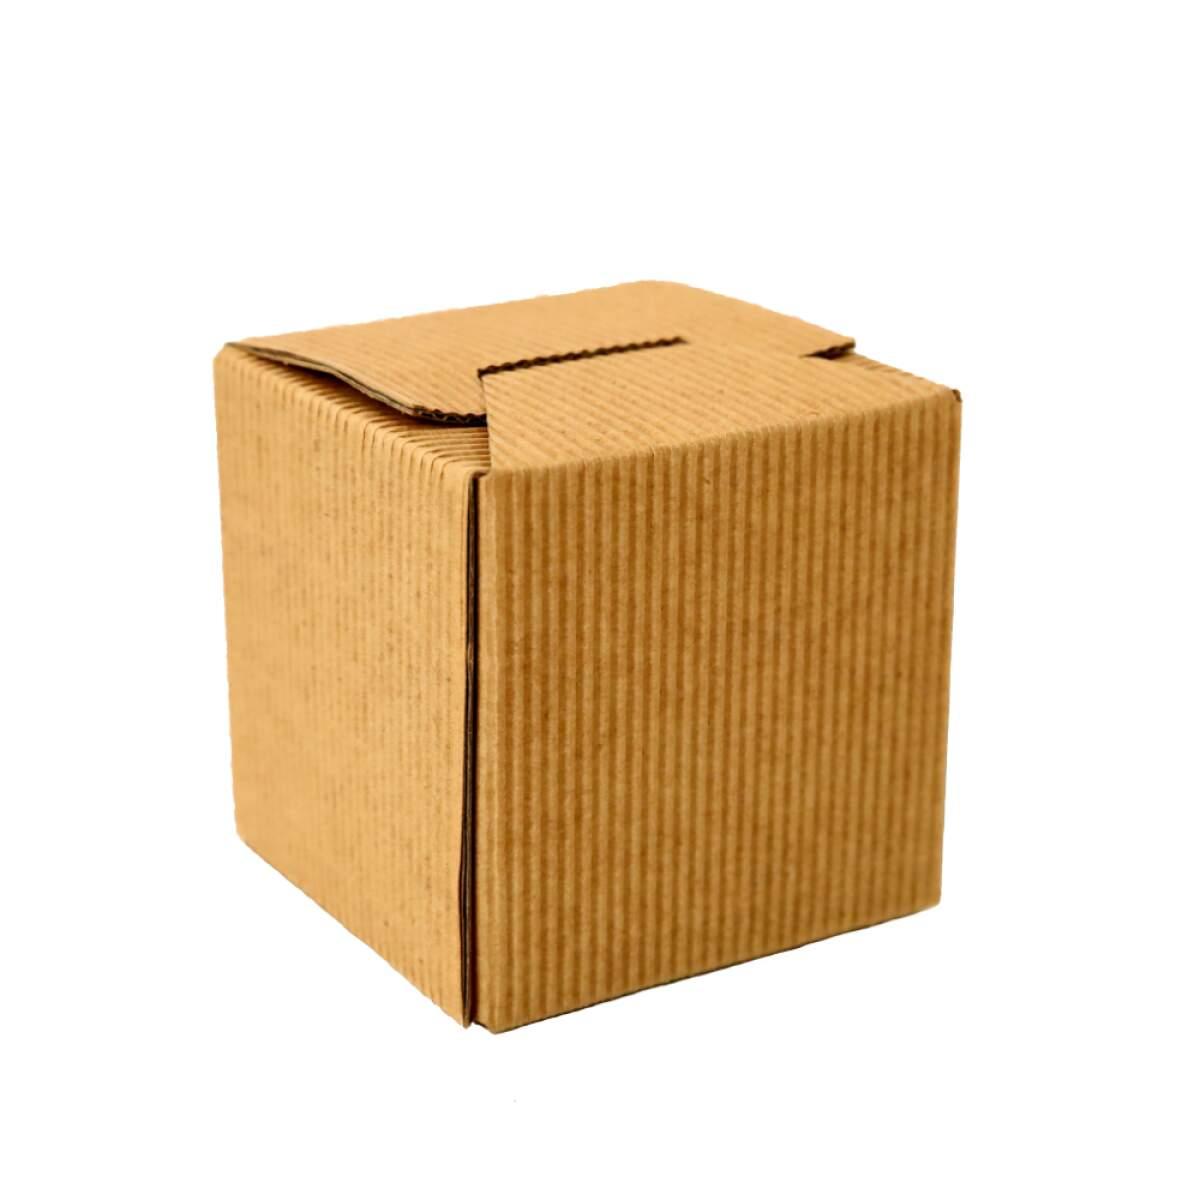 Box-Kubus-nature_2111_1000px